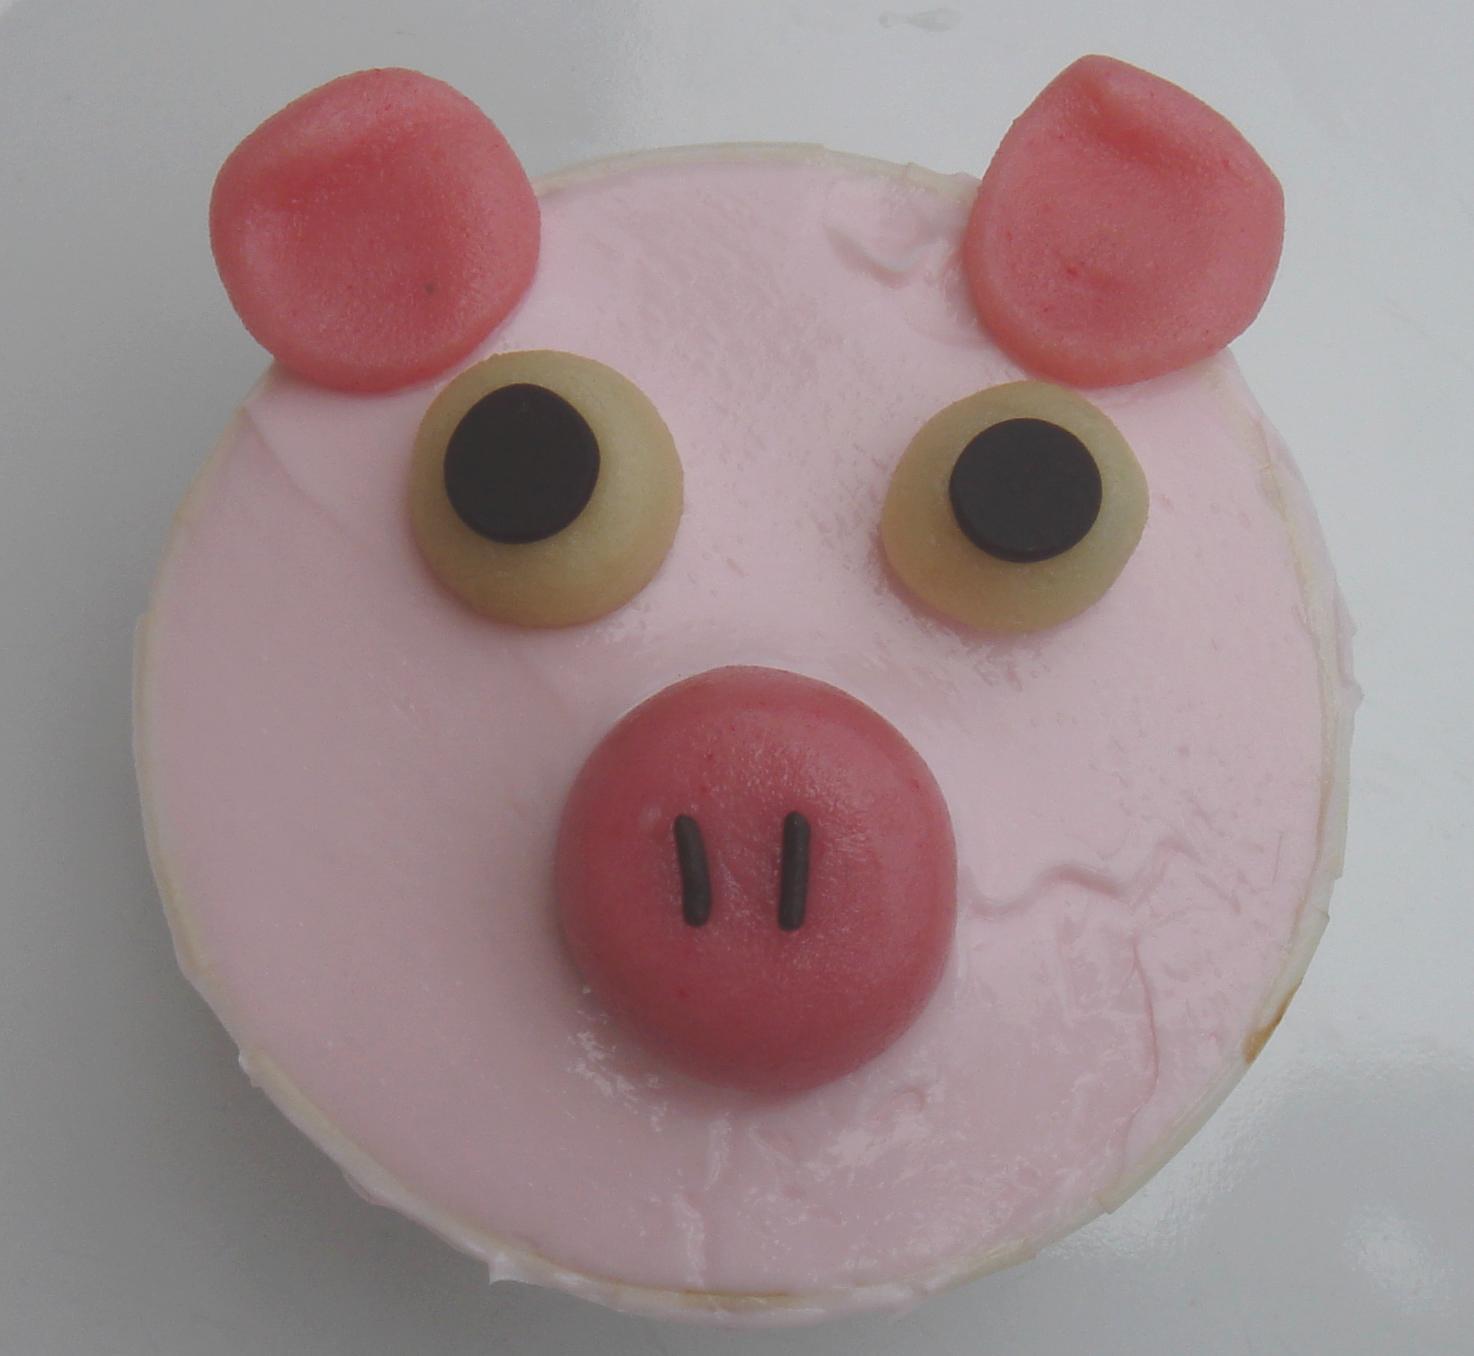 http://1.bp.blogspot.com/-4glCt6paatU/TaSR12ujvAI/AAAAAAAAMeo/4TvTTeJHZFE/s1600/pig_cupcakes.jpg